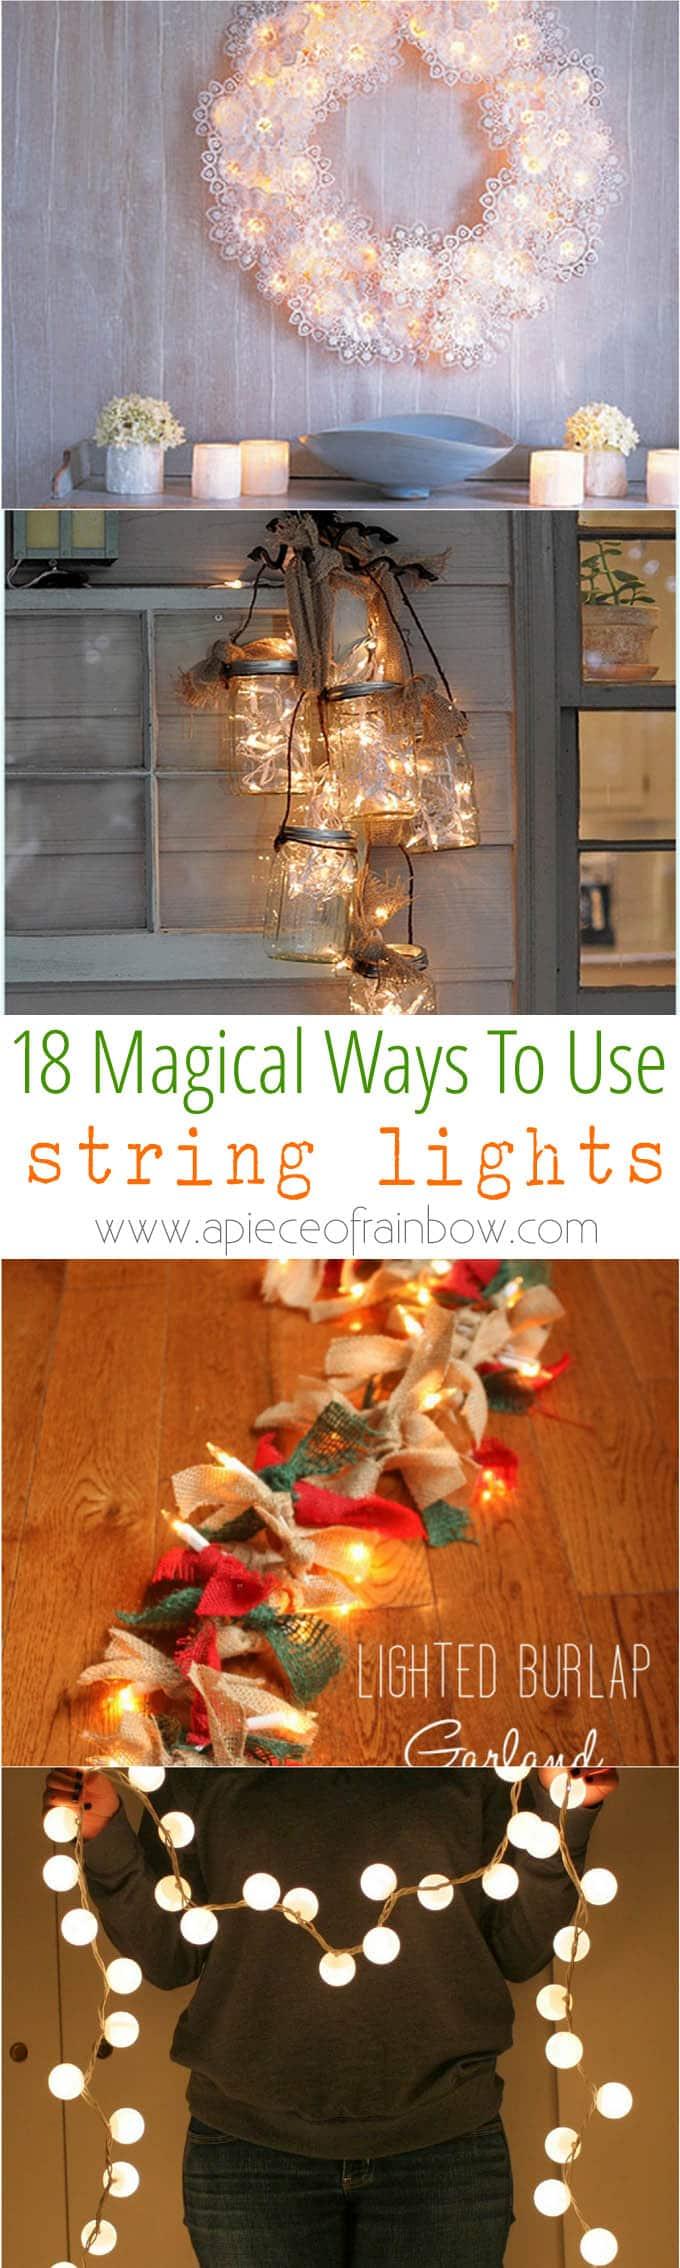 18-magical-string-lights-apieceofrainbowblog